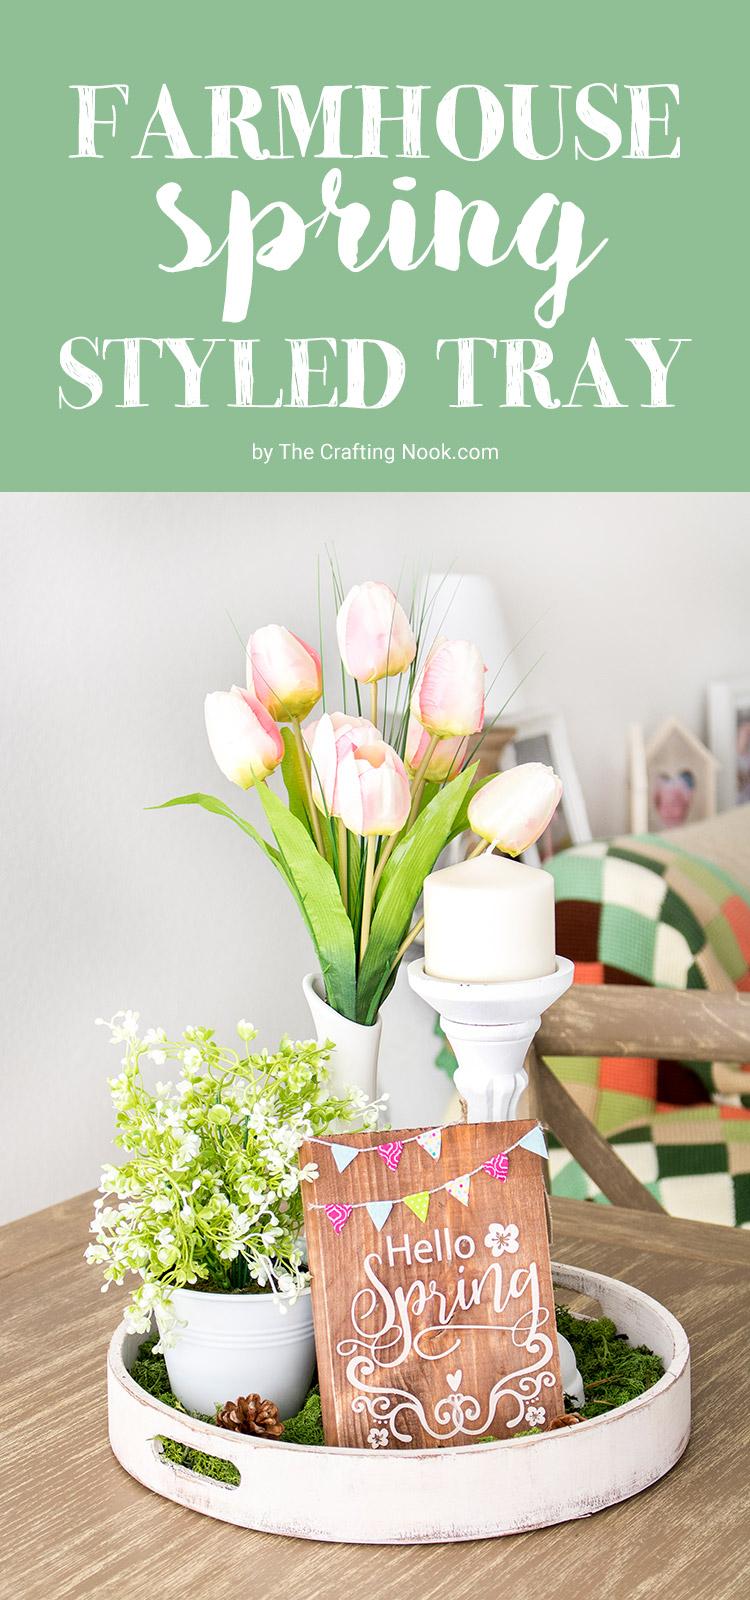 DIY Farmhouse Spring Styled Tray